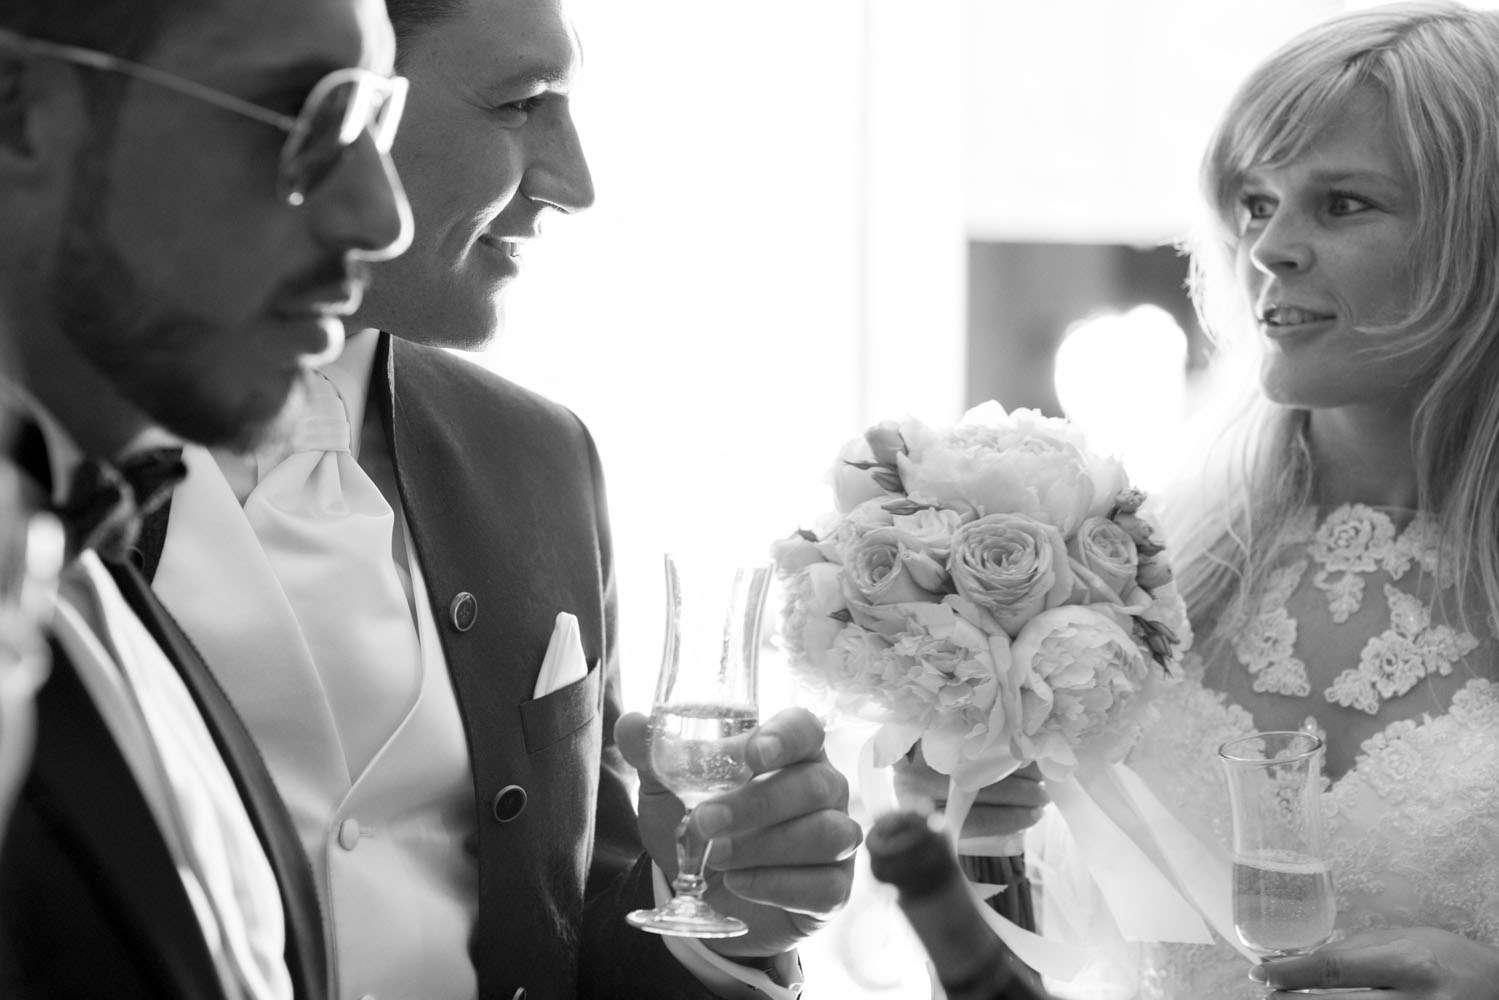 foto nozze taormina